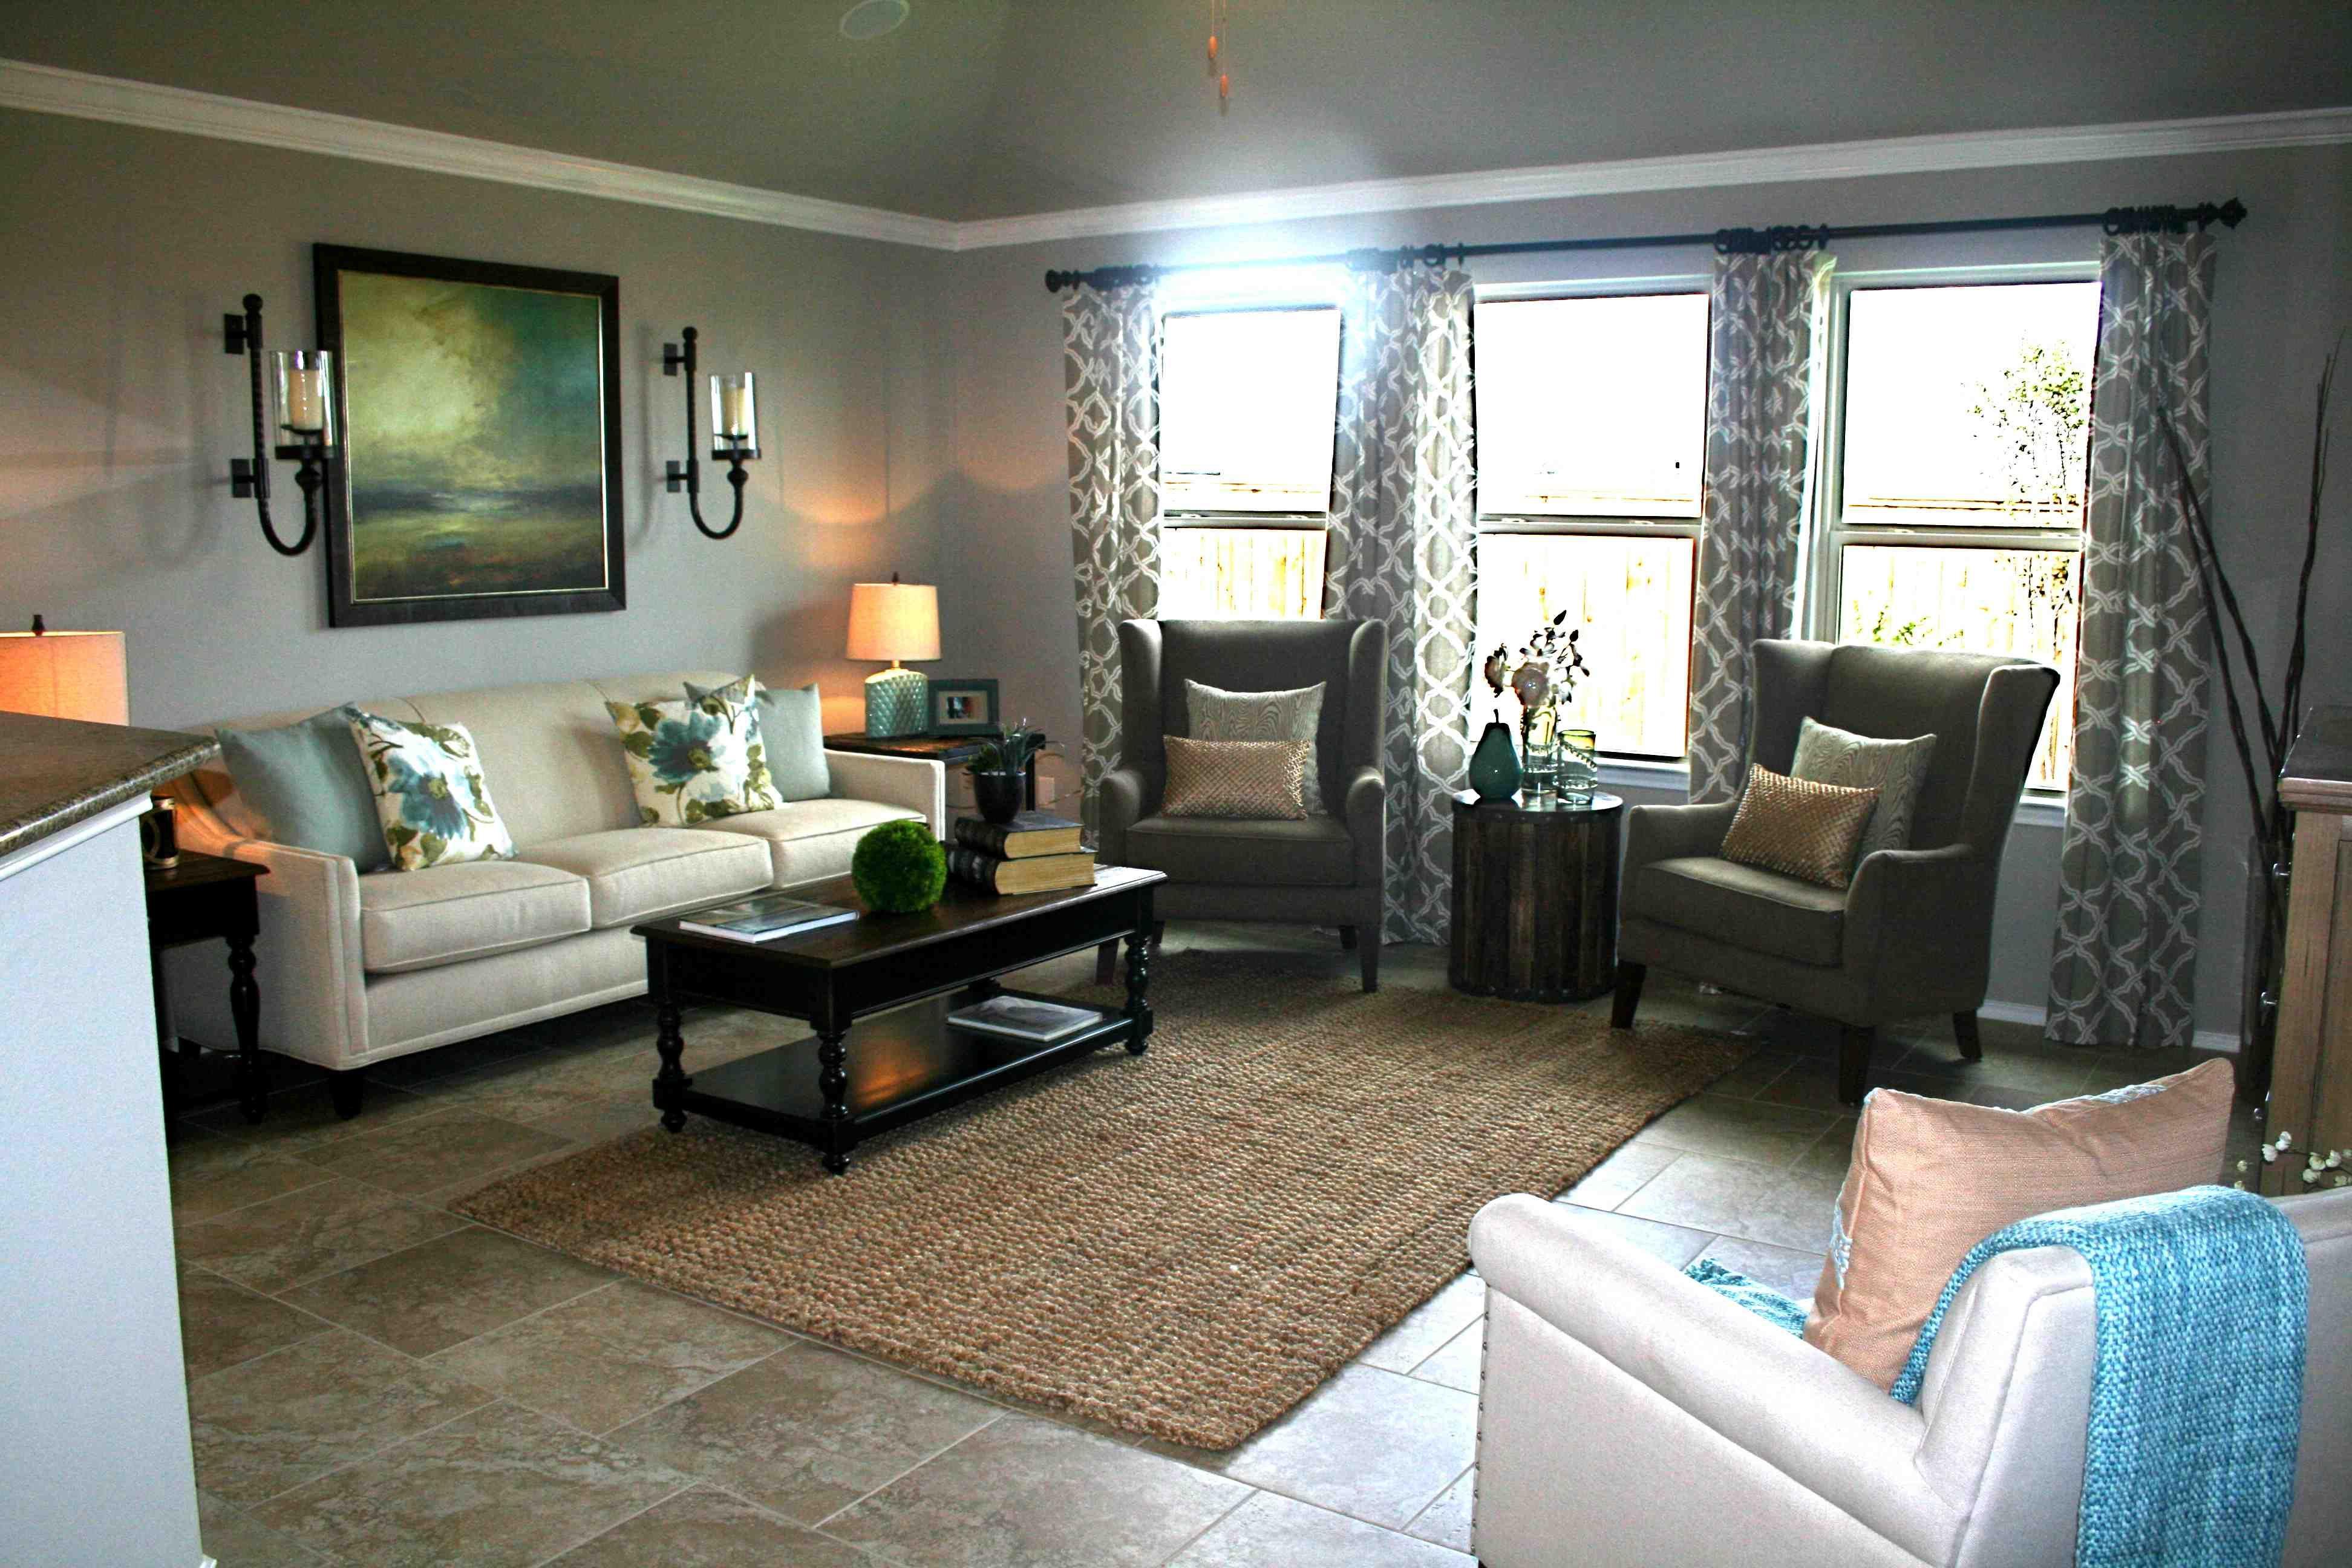 D.R. Horton & Lennar Model Homes   Home, Living room drapes